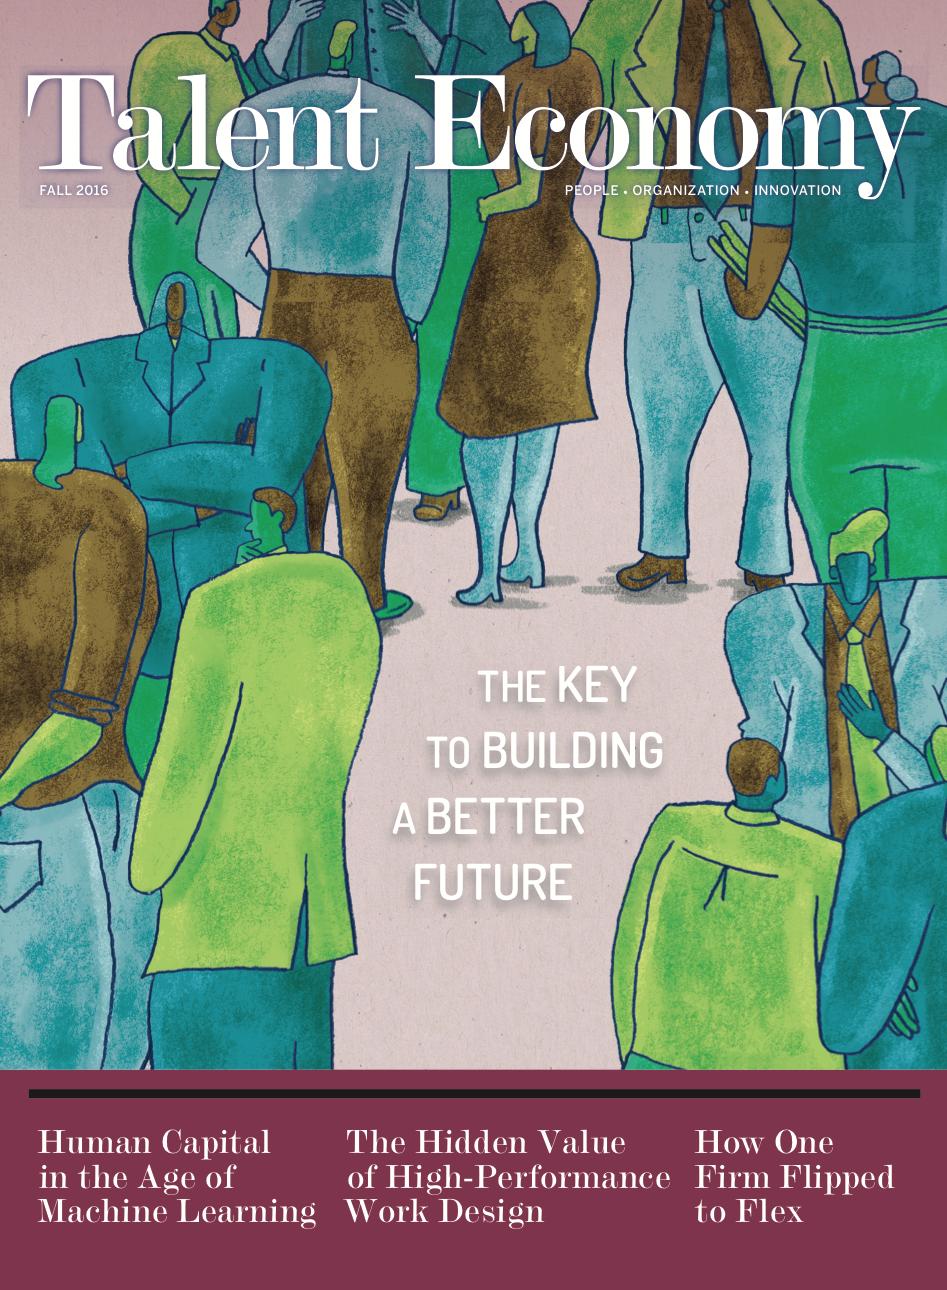 Talent Economy Magazine